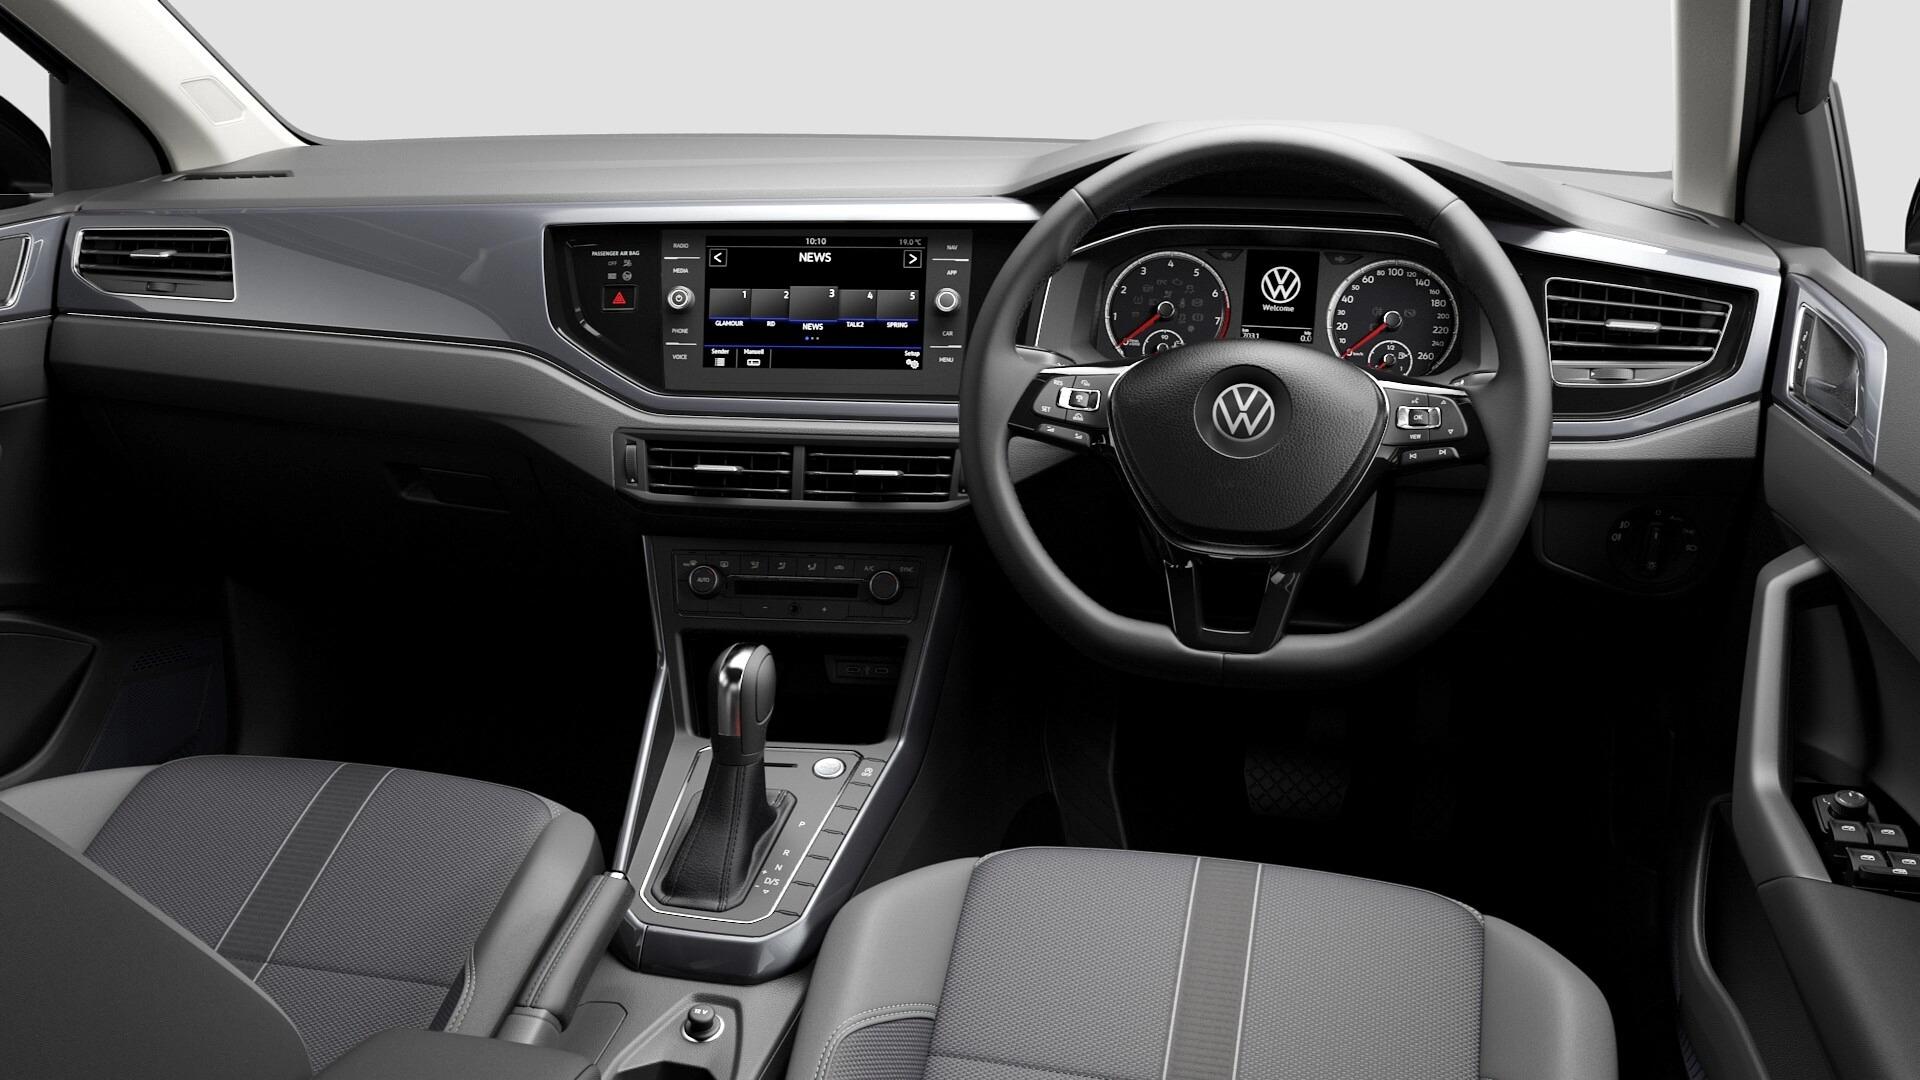 Polo TSI Highline純正ナビ・セーフティパッケージ・テクノロジーパッケージ装着車の画像4